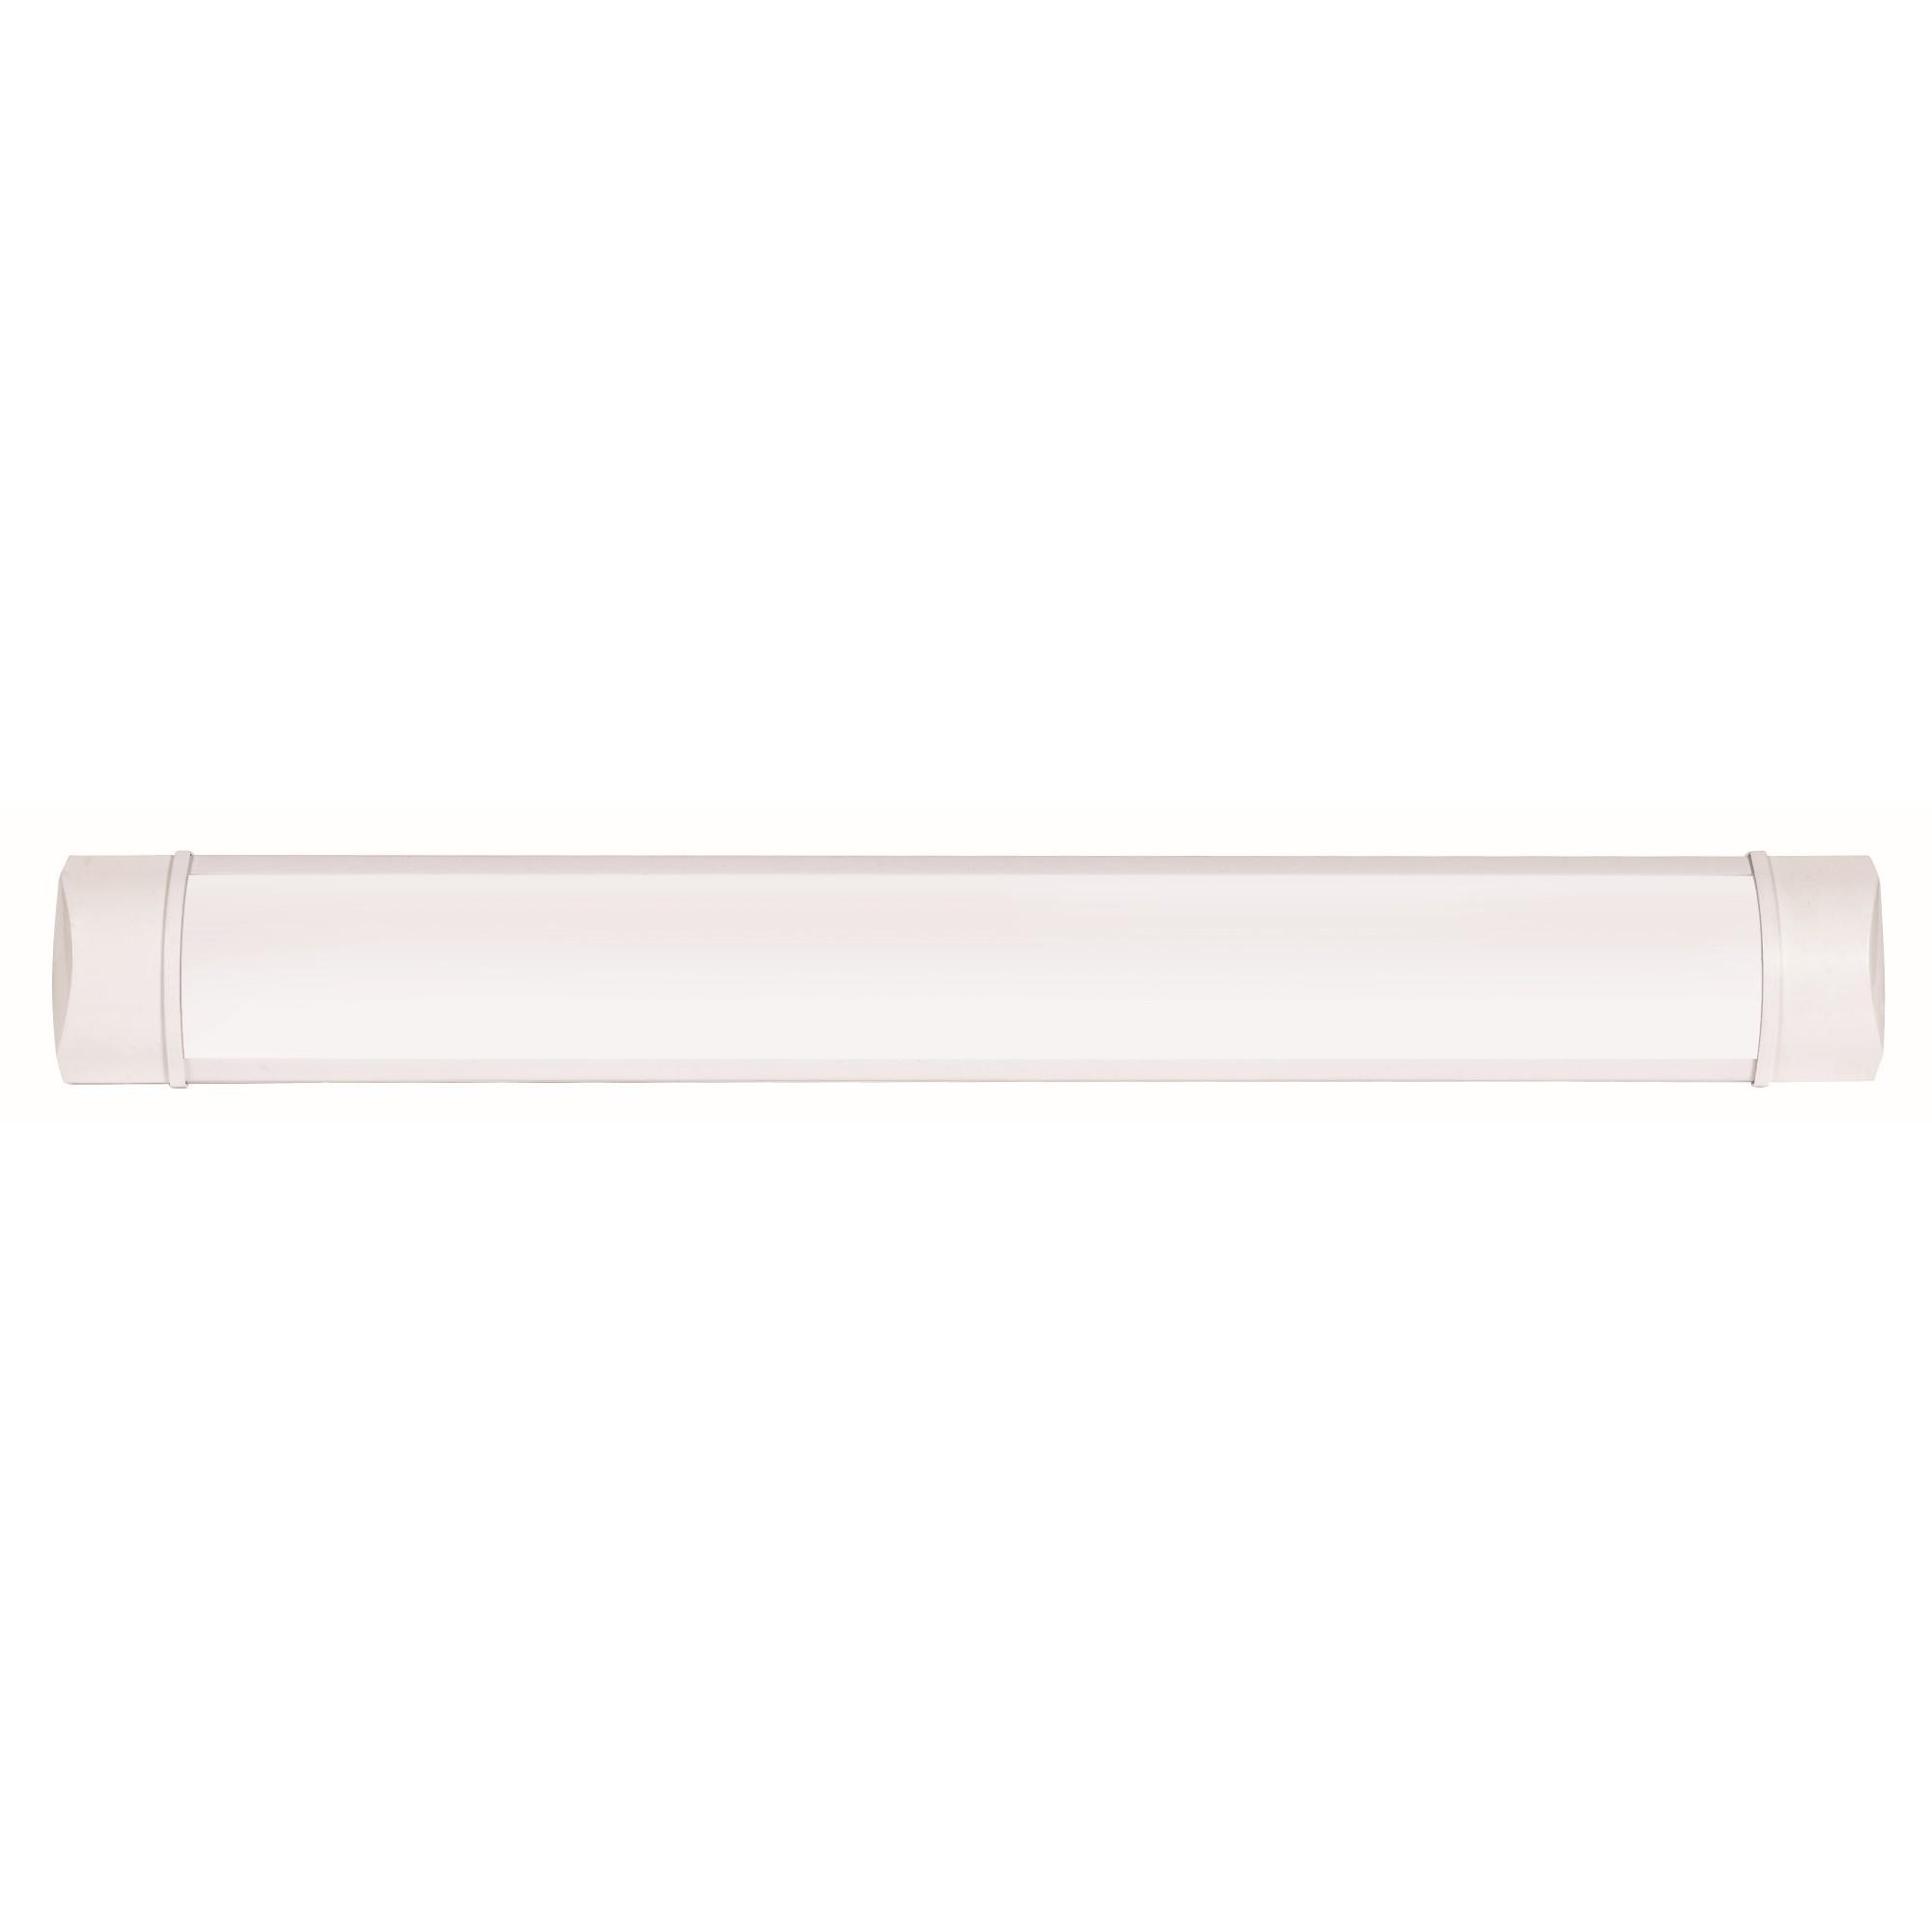 Luminaria Tubular de Sobrepor Plastico Branca 18W Bivolt - Ecoline